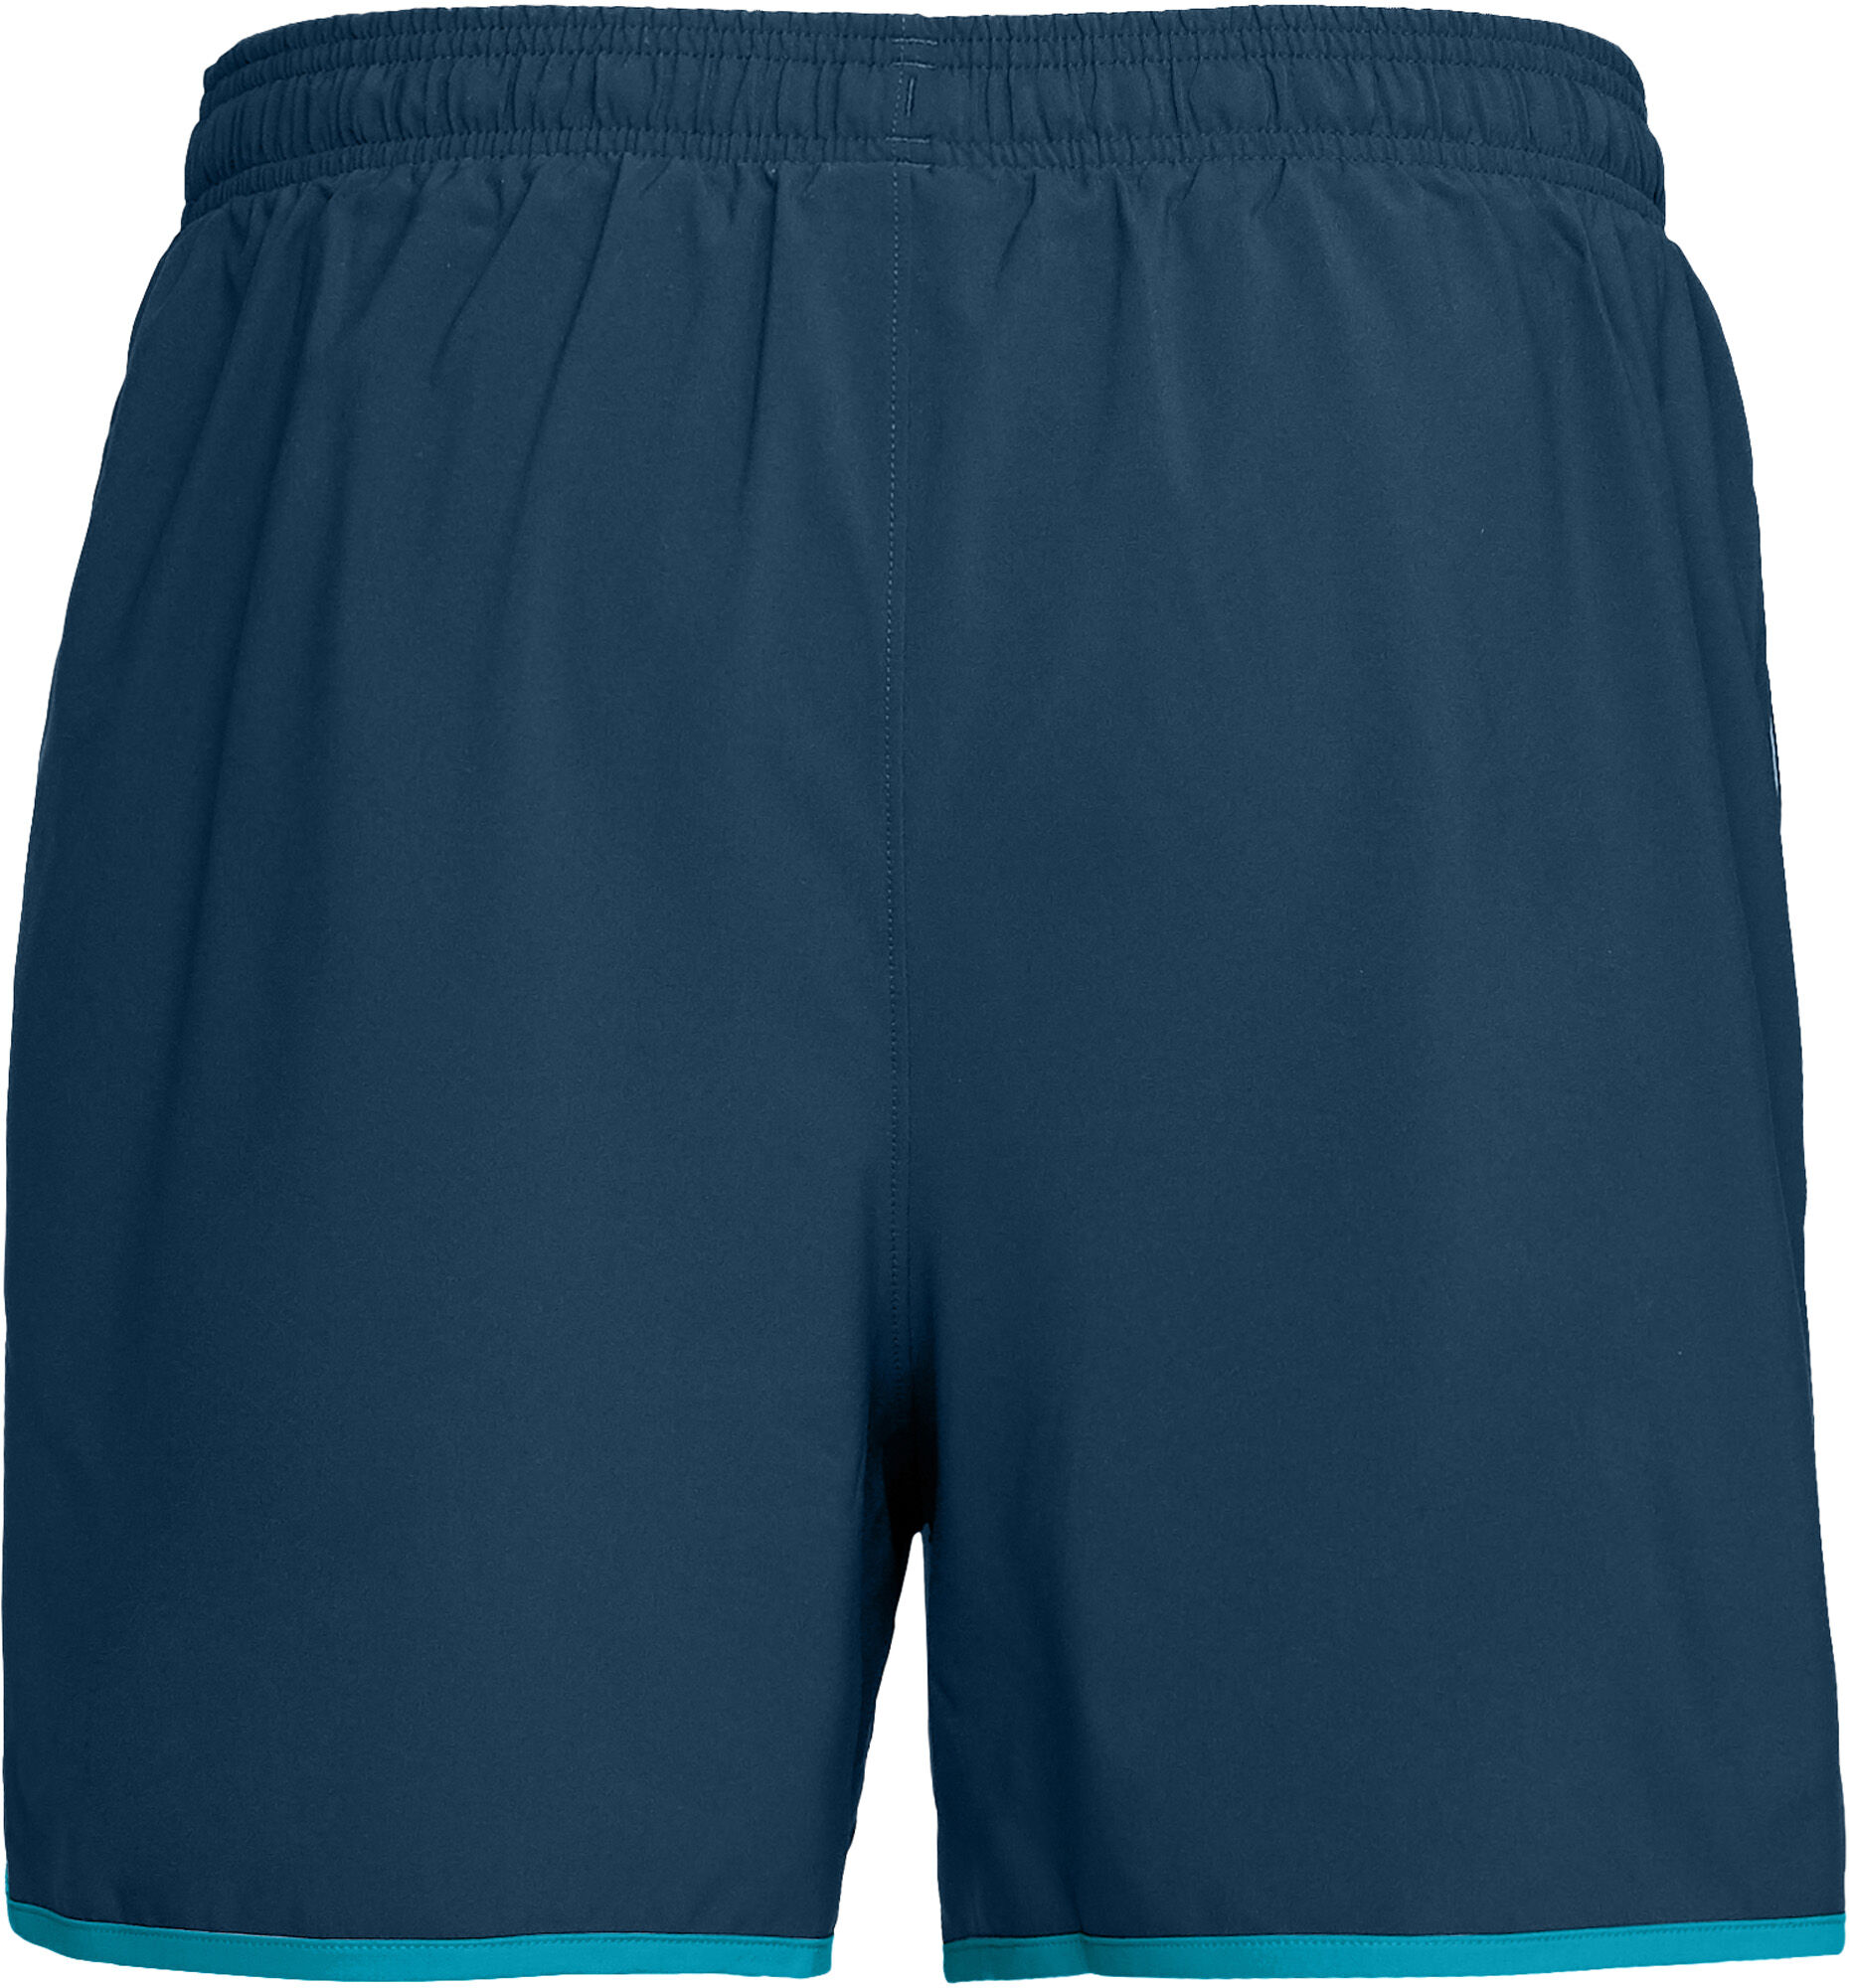 f275ca4503c55 Under Armour UA Qualifier 2-in-1 Short Shorts